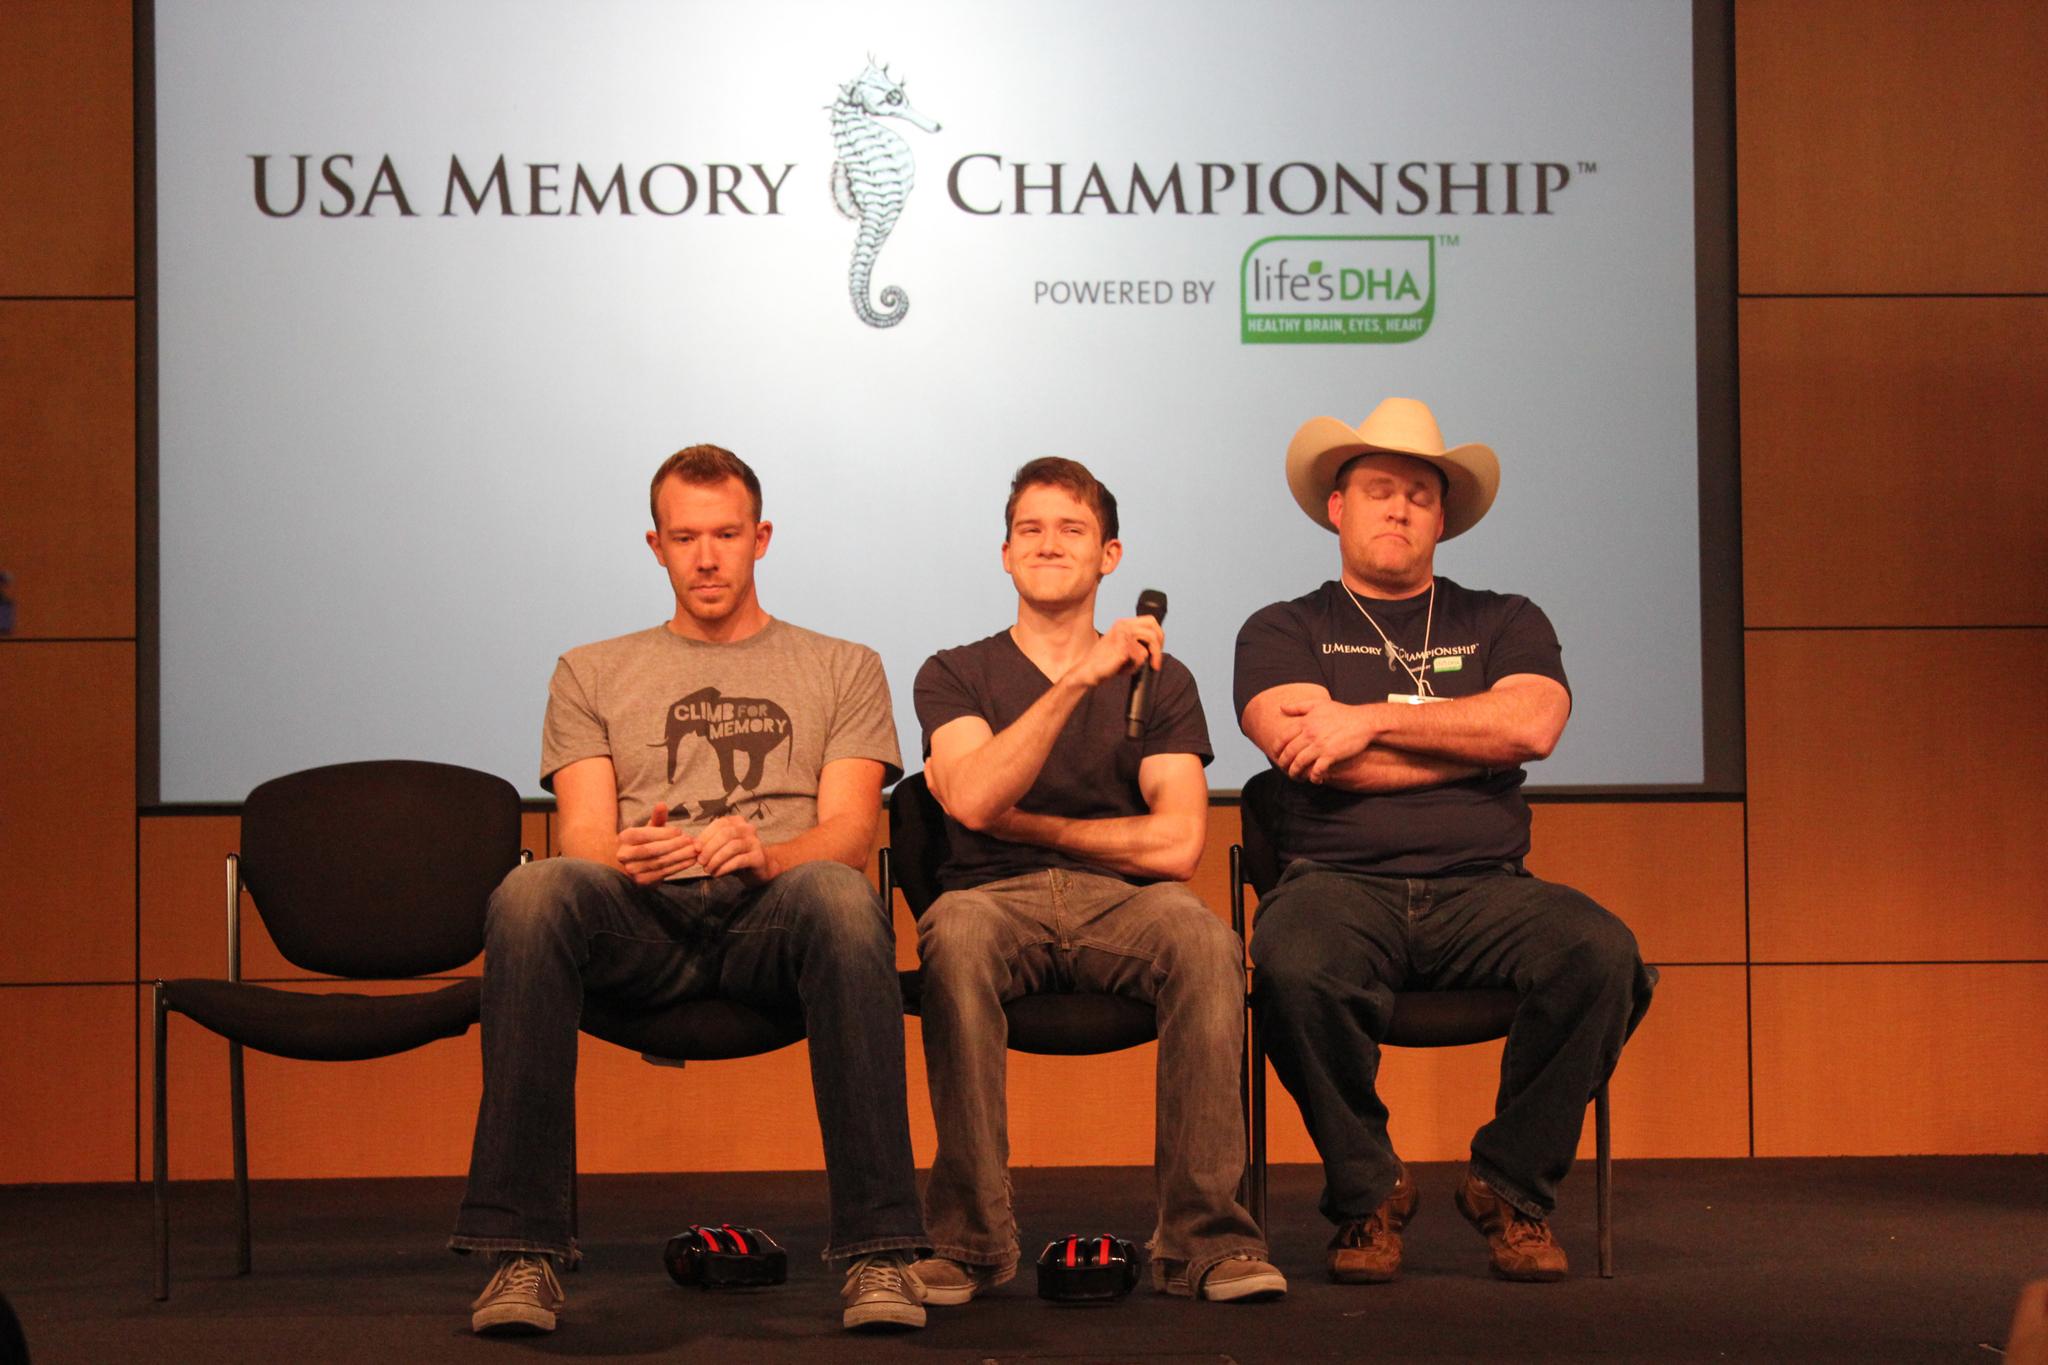 USA Memory Championship